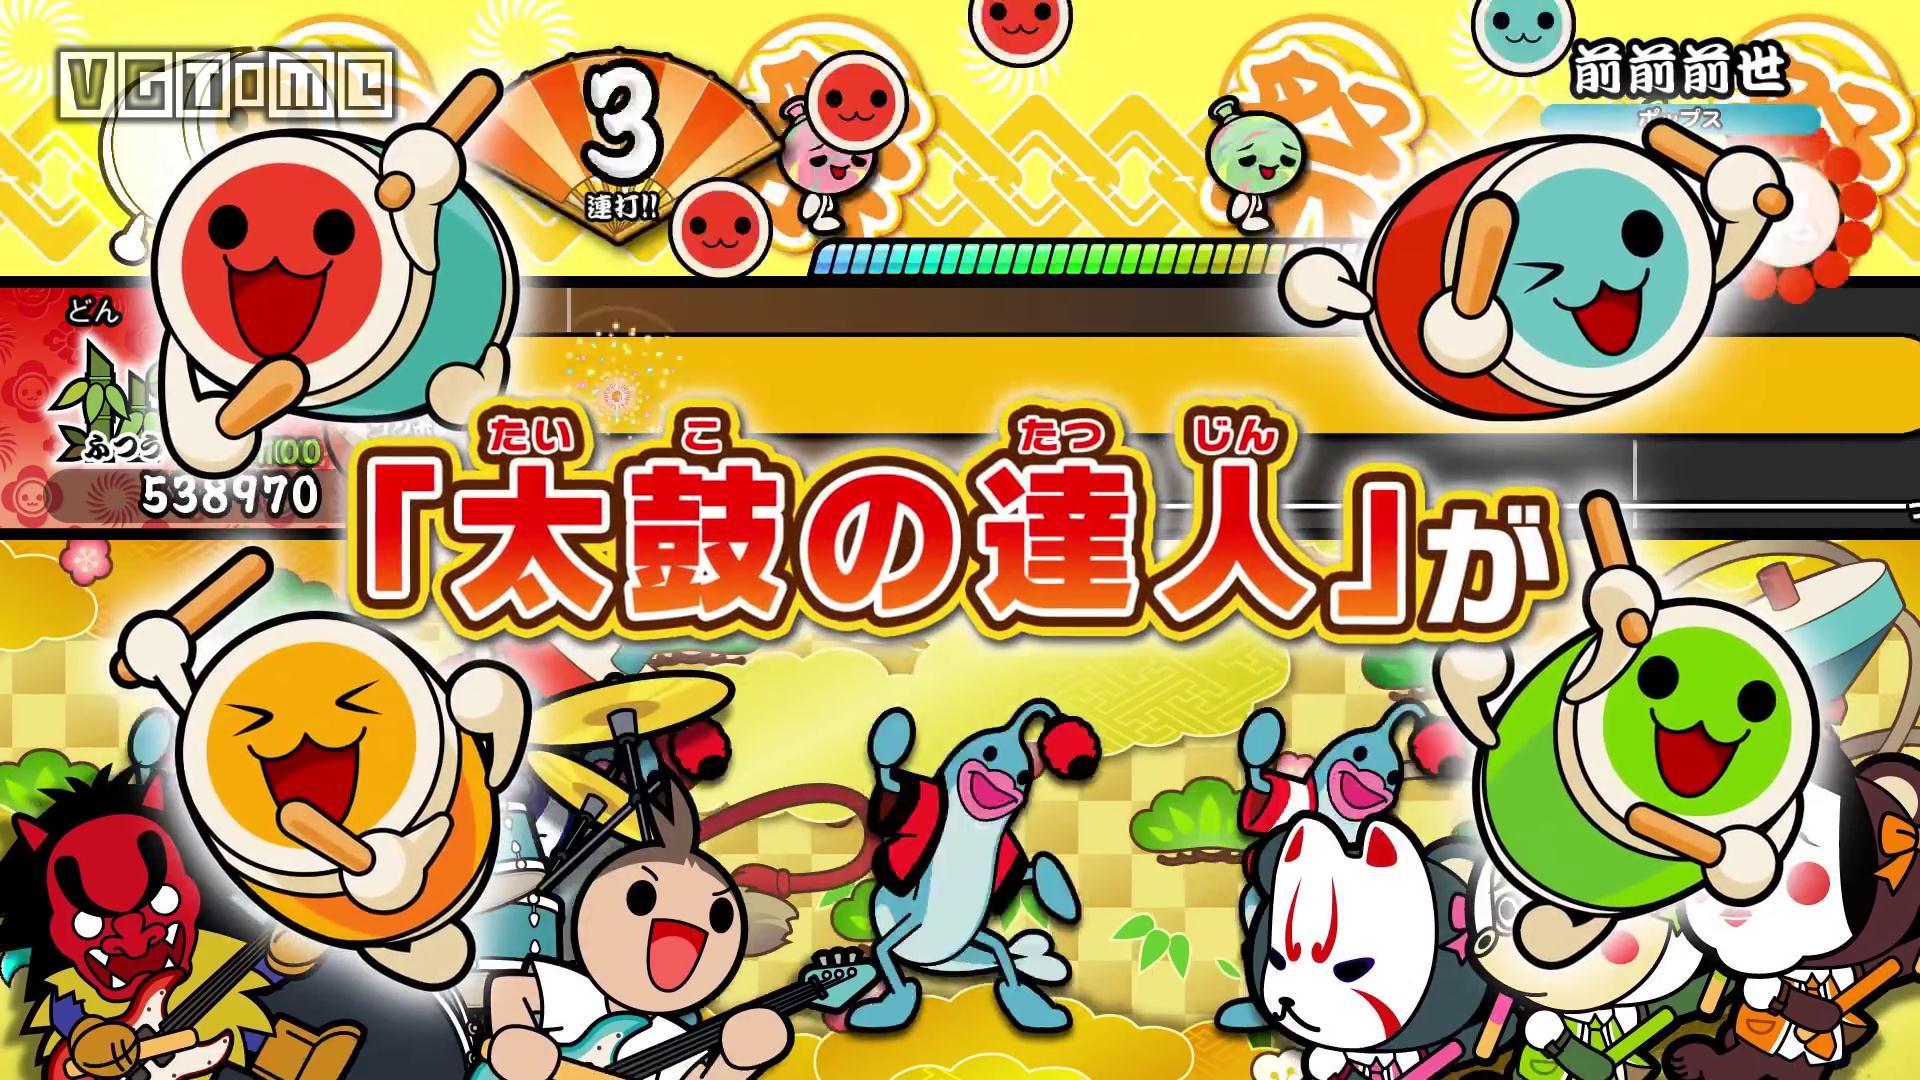 Switch《太鼓达人》发售日确定 中文版同步推出